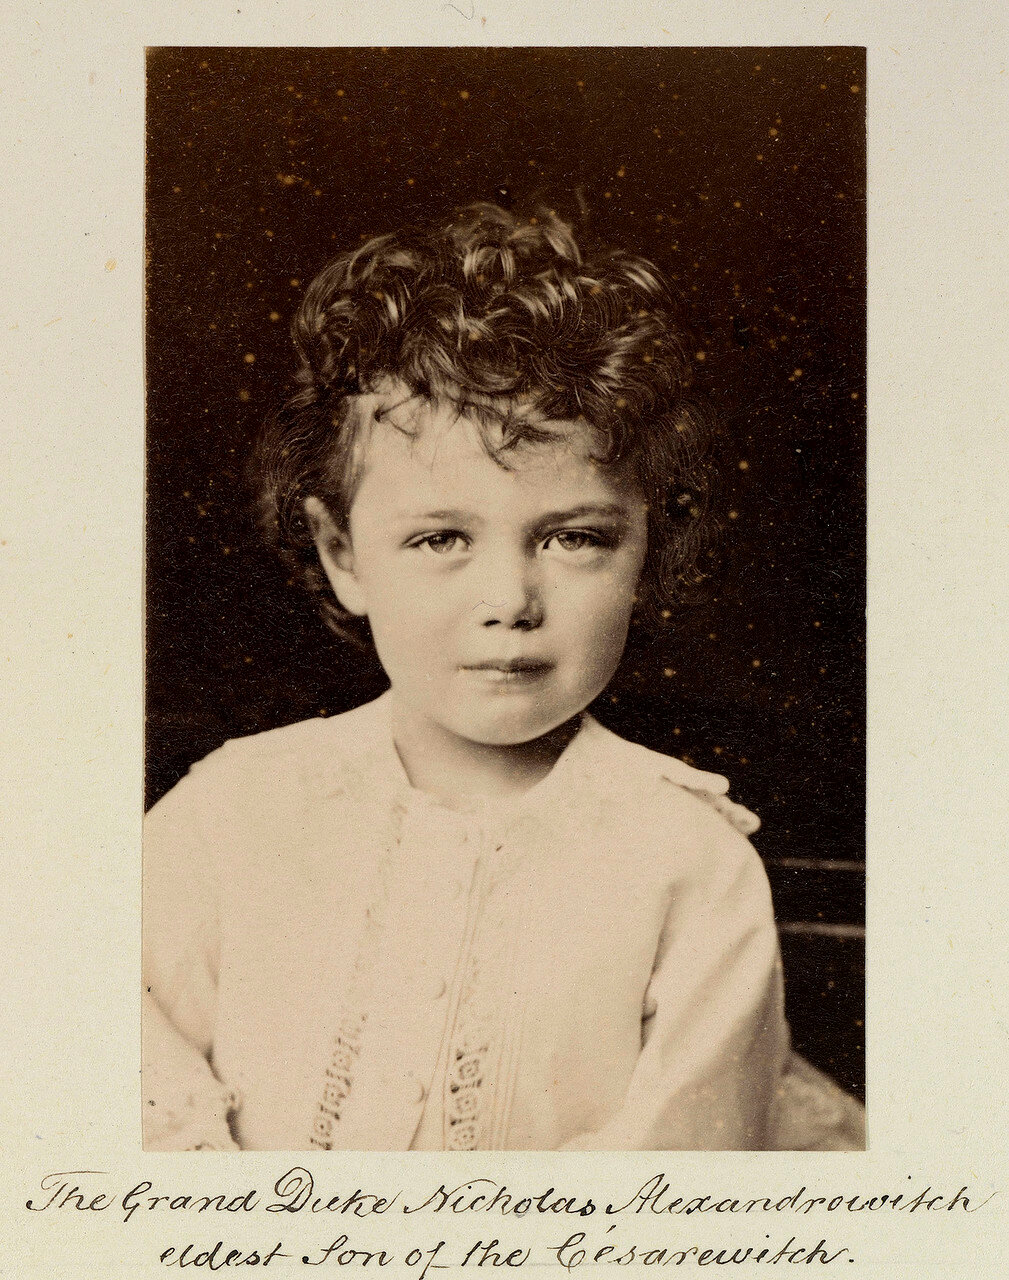 Великий князь Николай Александрович (1868-1918), будущий император Николай II, 1873